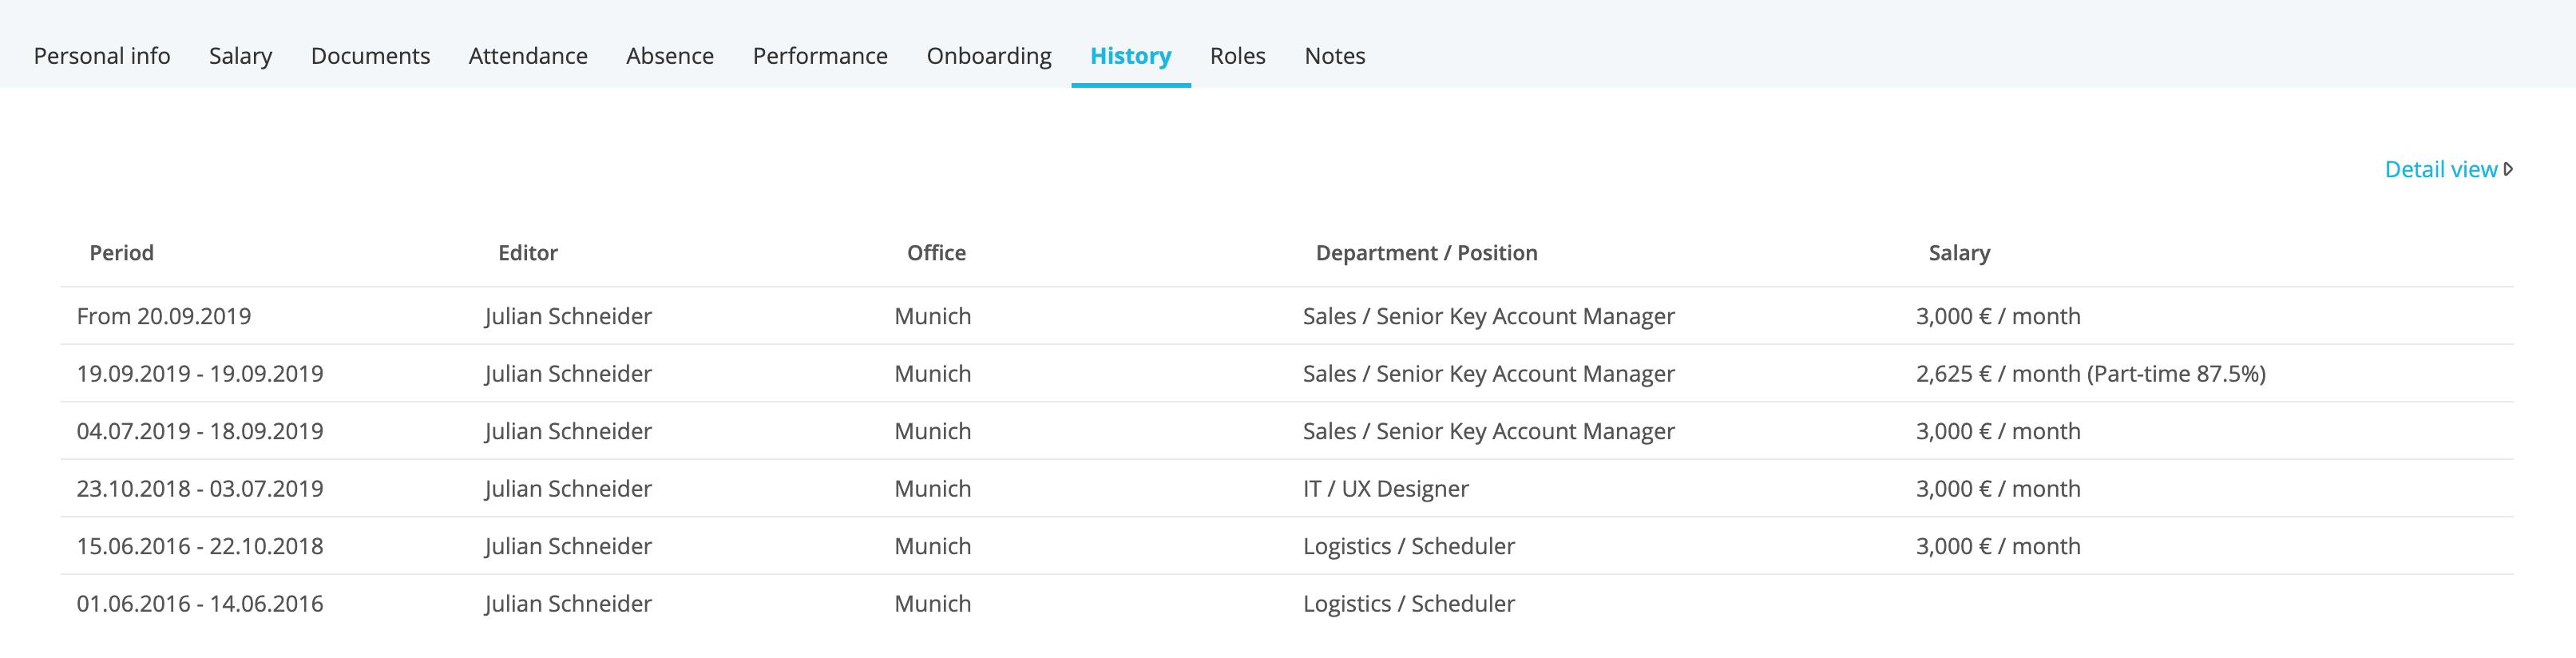 employee-history-1_en-us.png